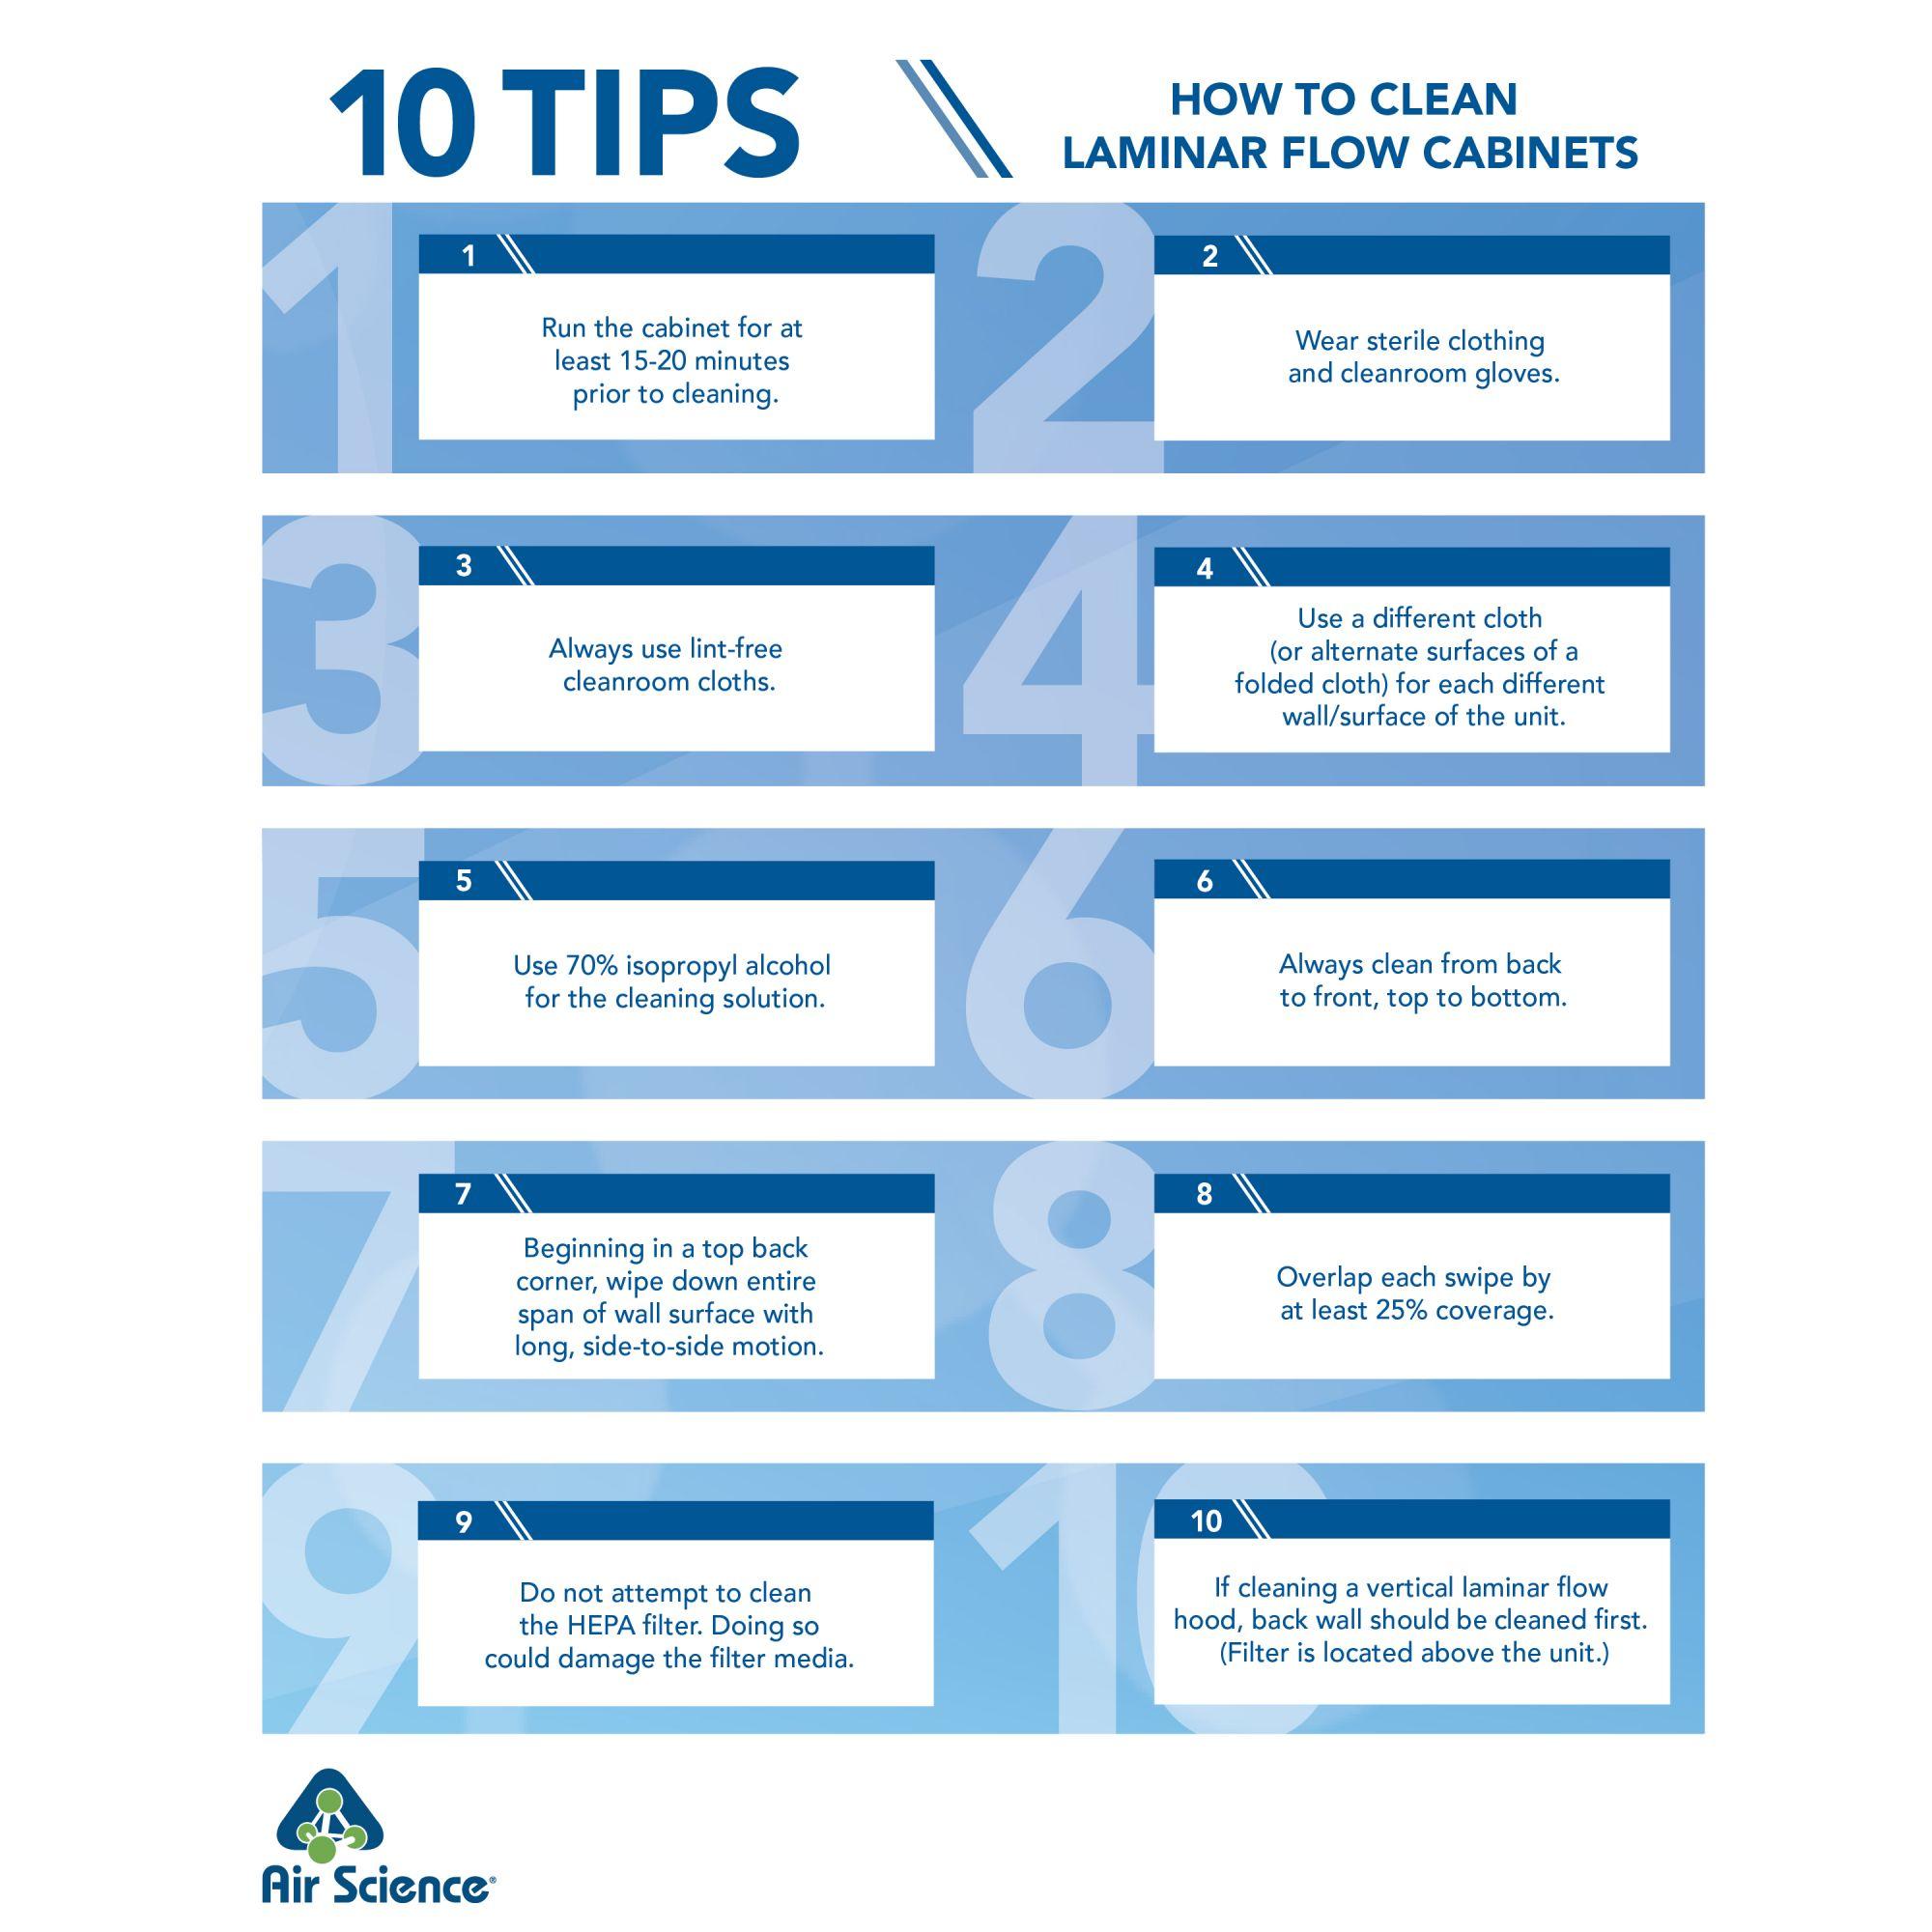 How to Clean a Laminar Flow Hood